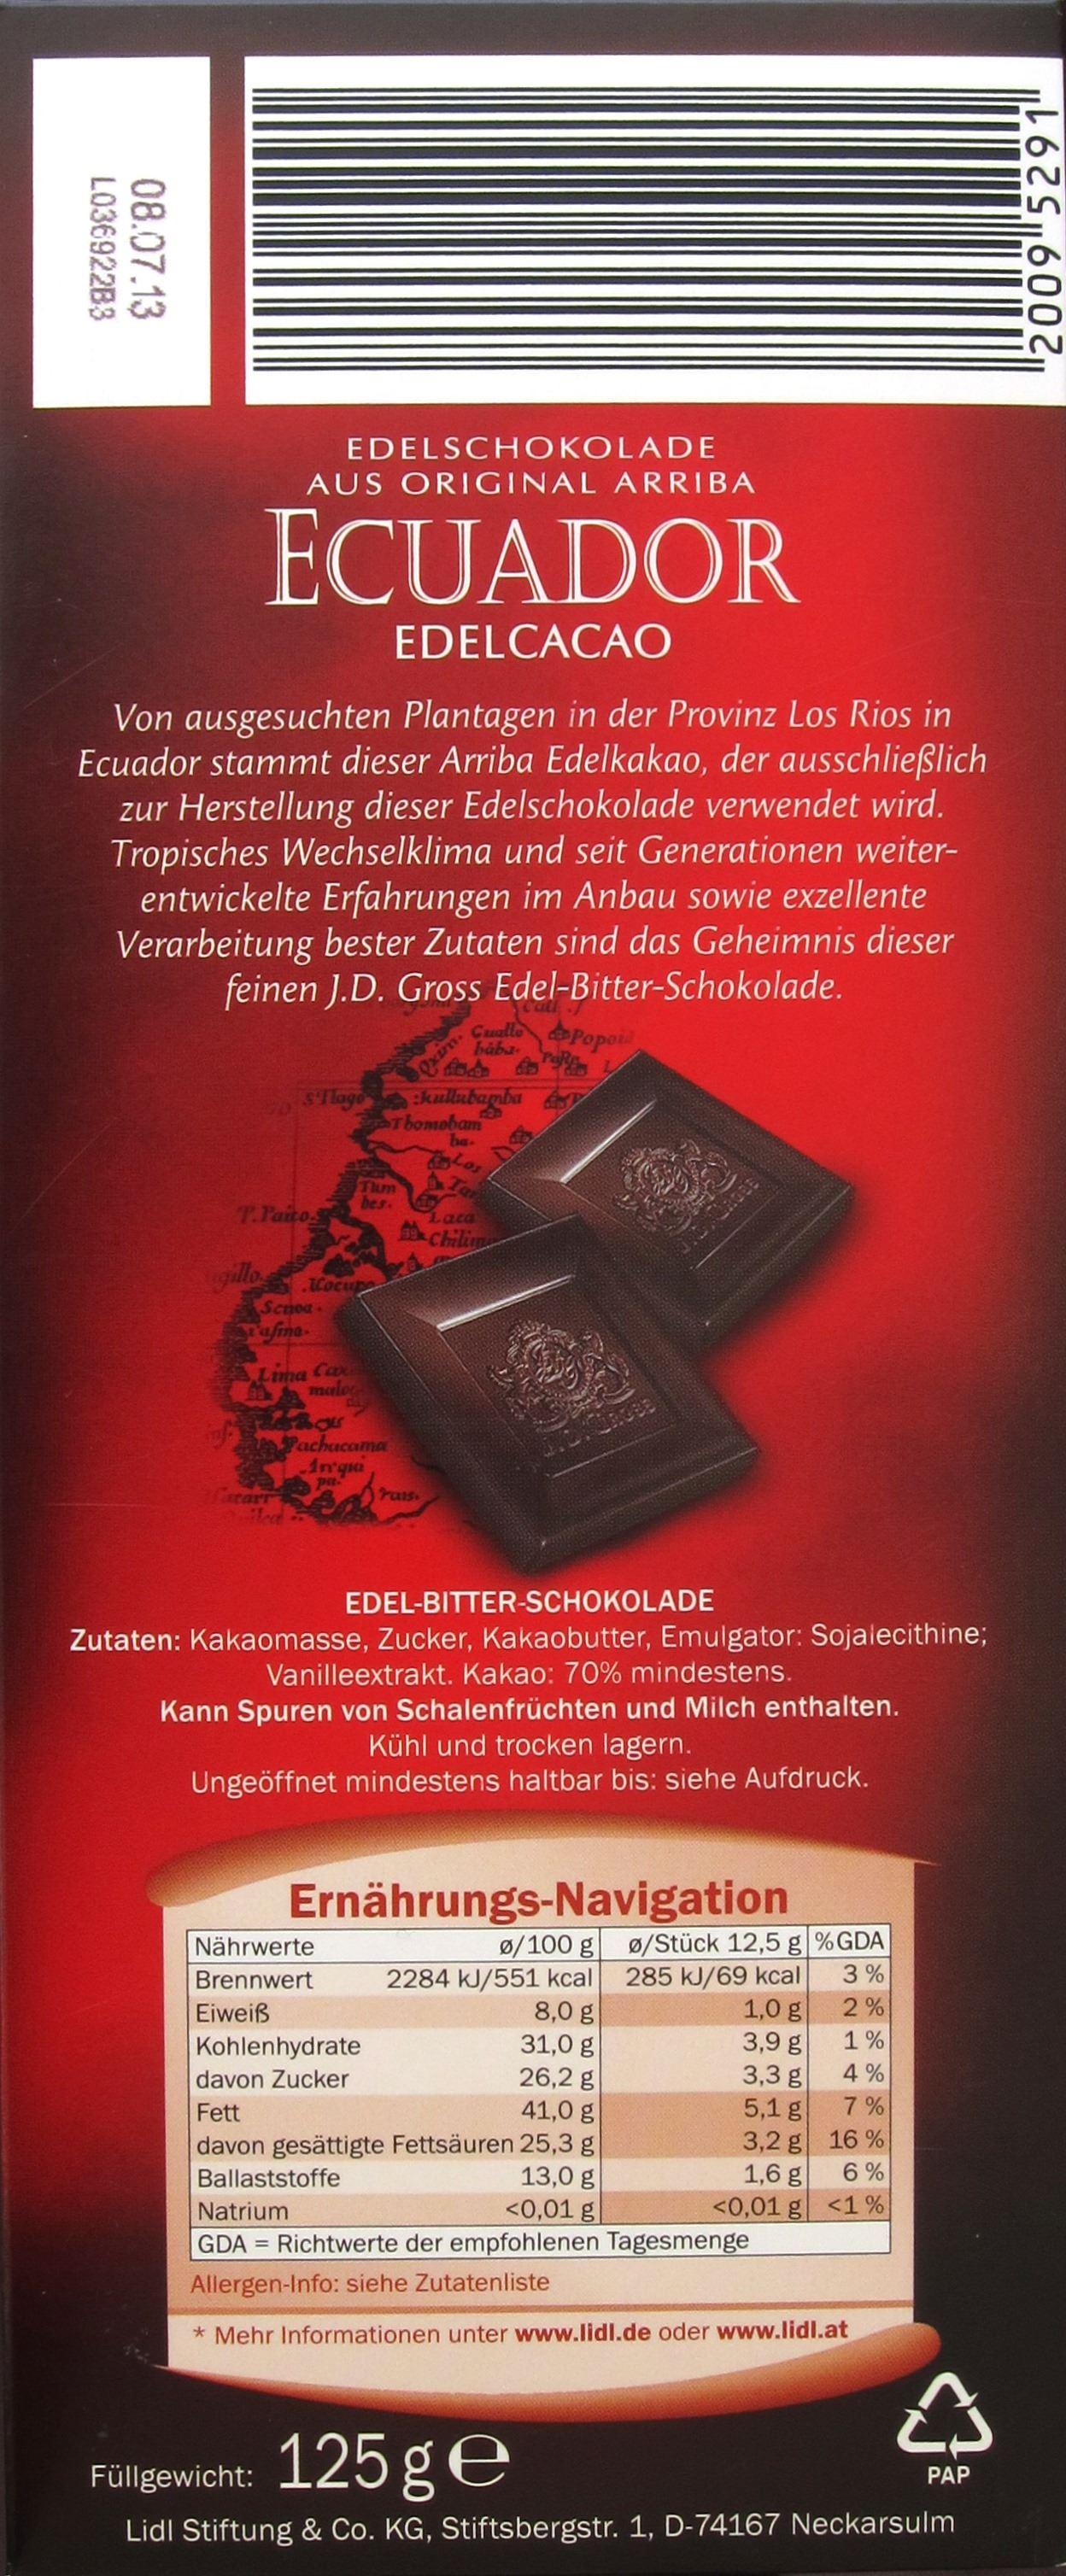 "Rausch/LIDL ""J. D. Gross"" Ecuador-70%-Schokolade - Packungsrückseite"